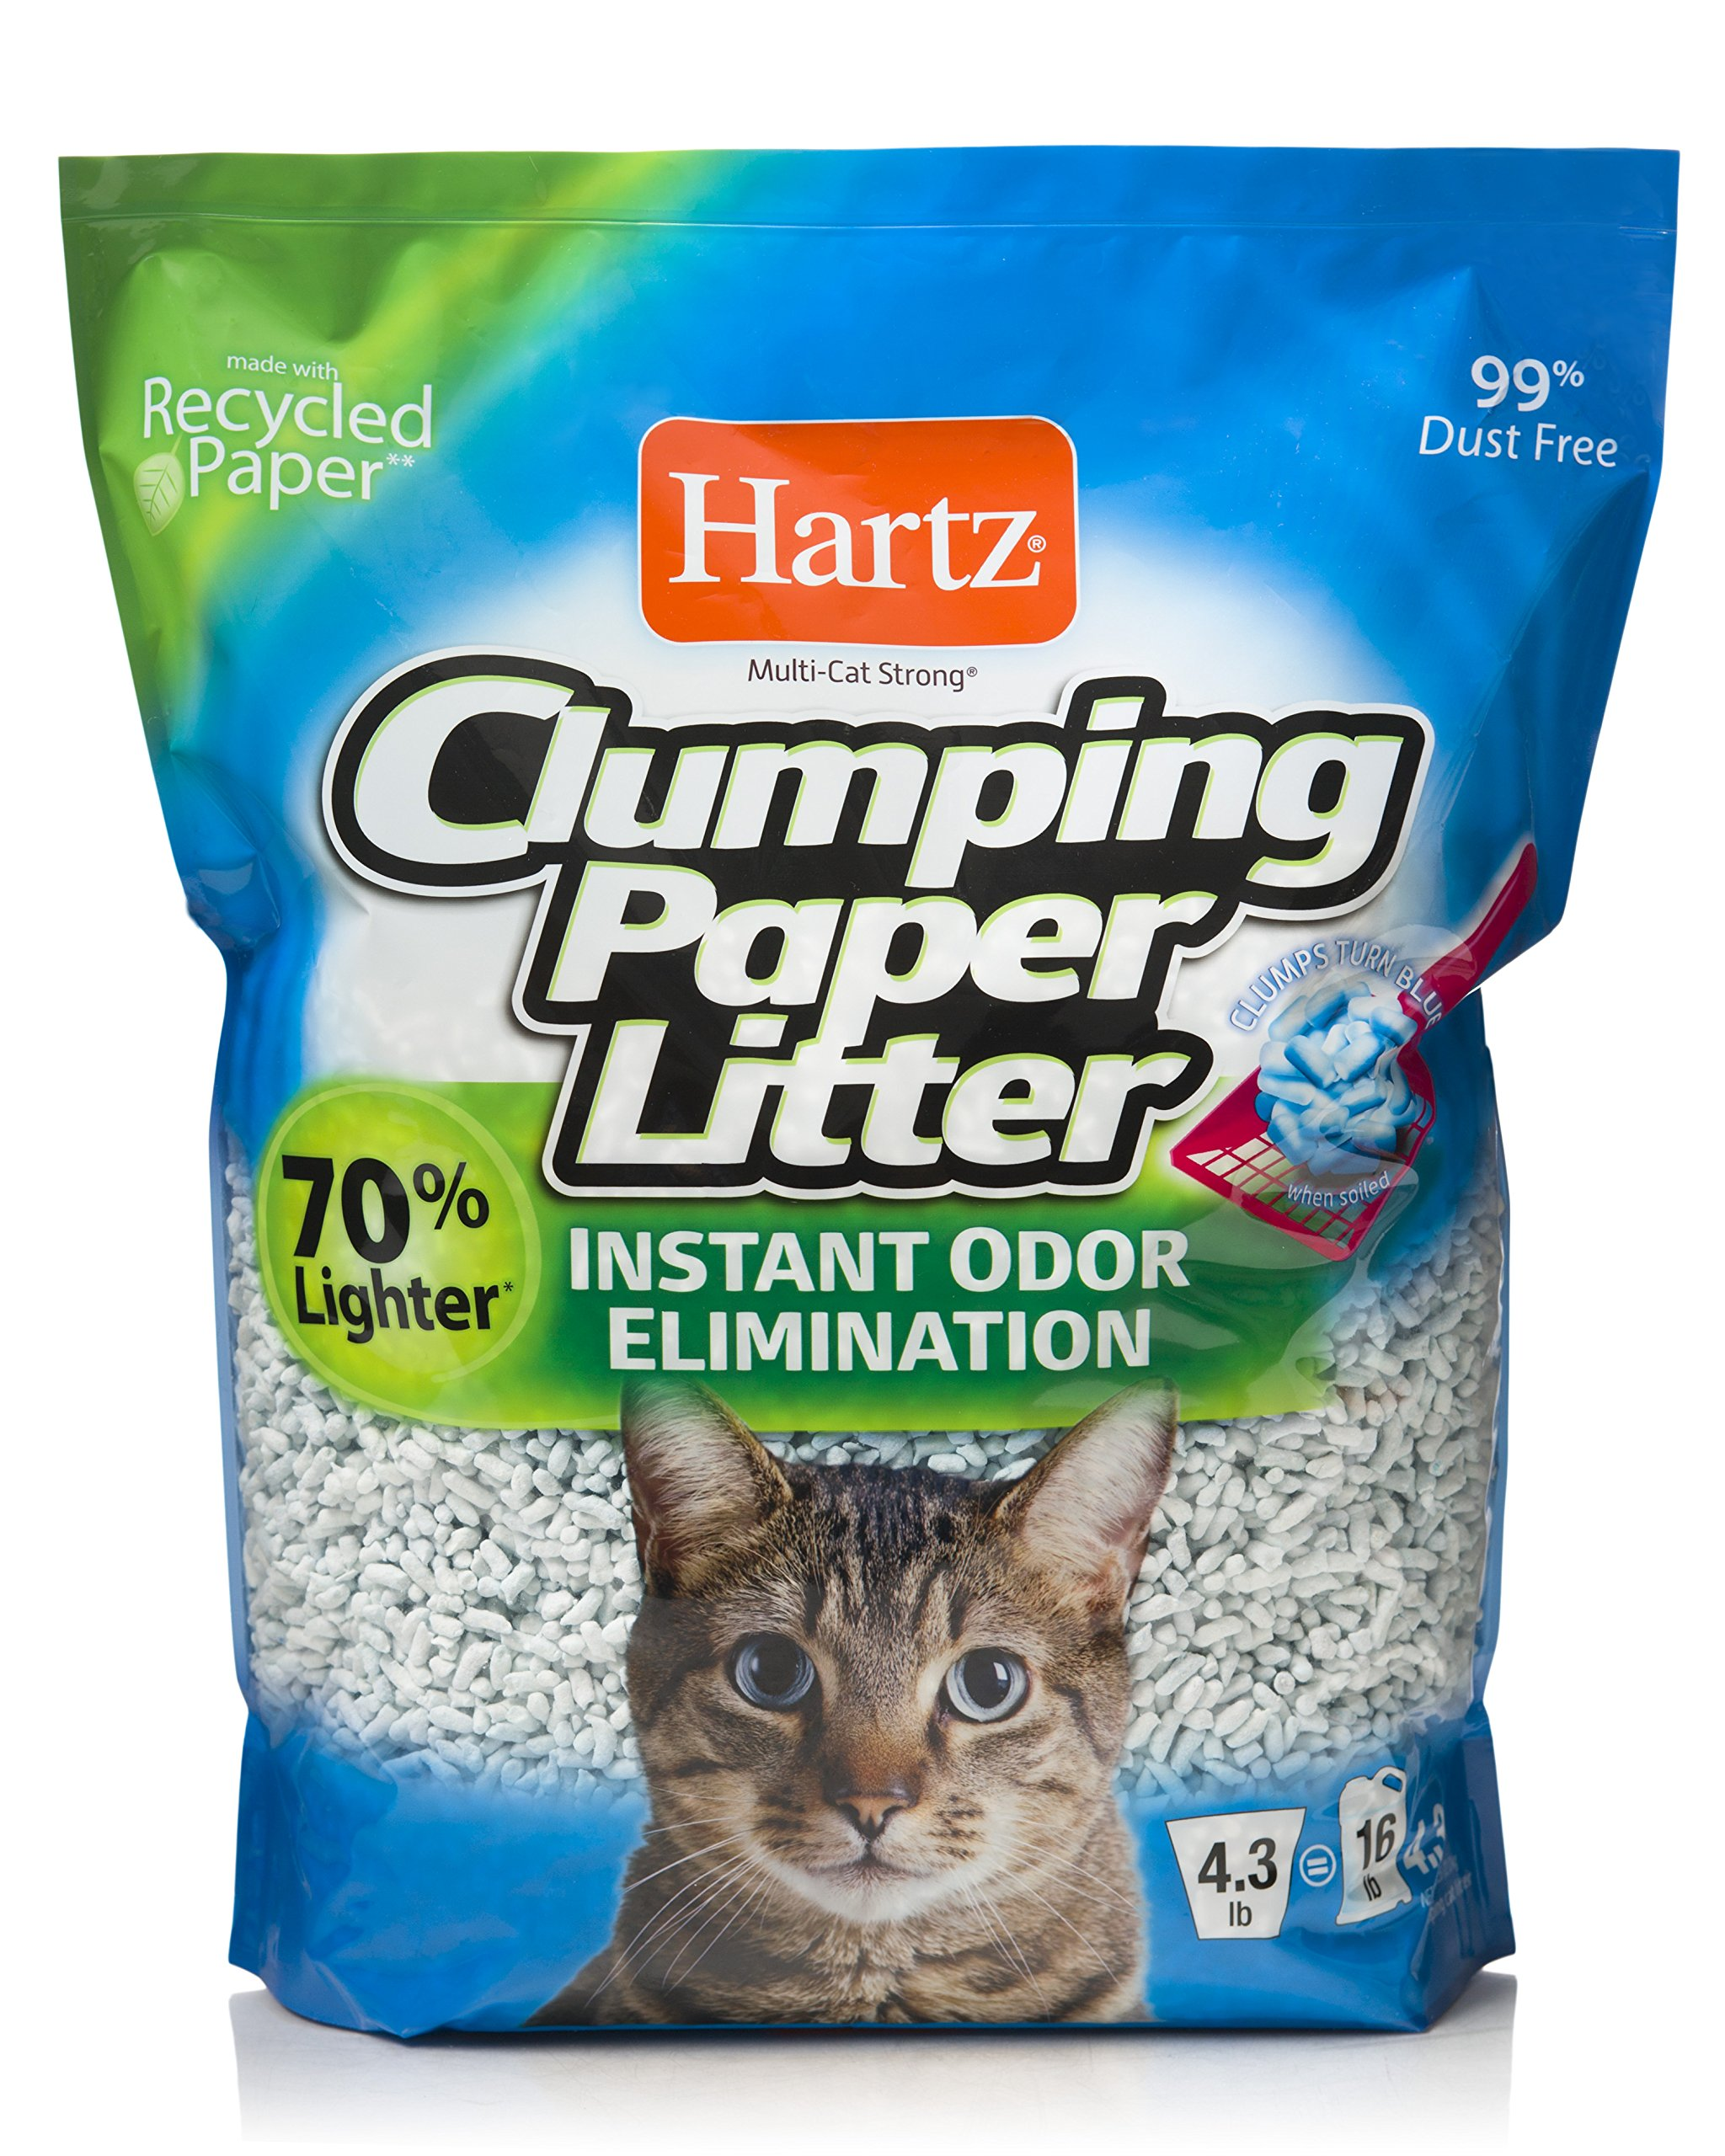 Hartz Multi-Cat Lightweight Recycled Clumping Paper Cat Litter,